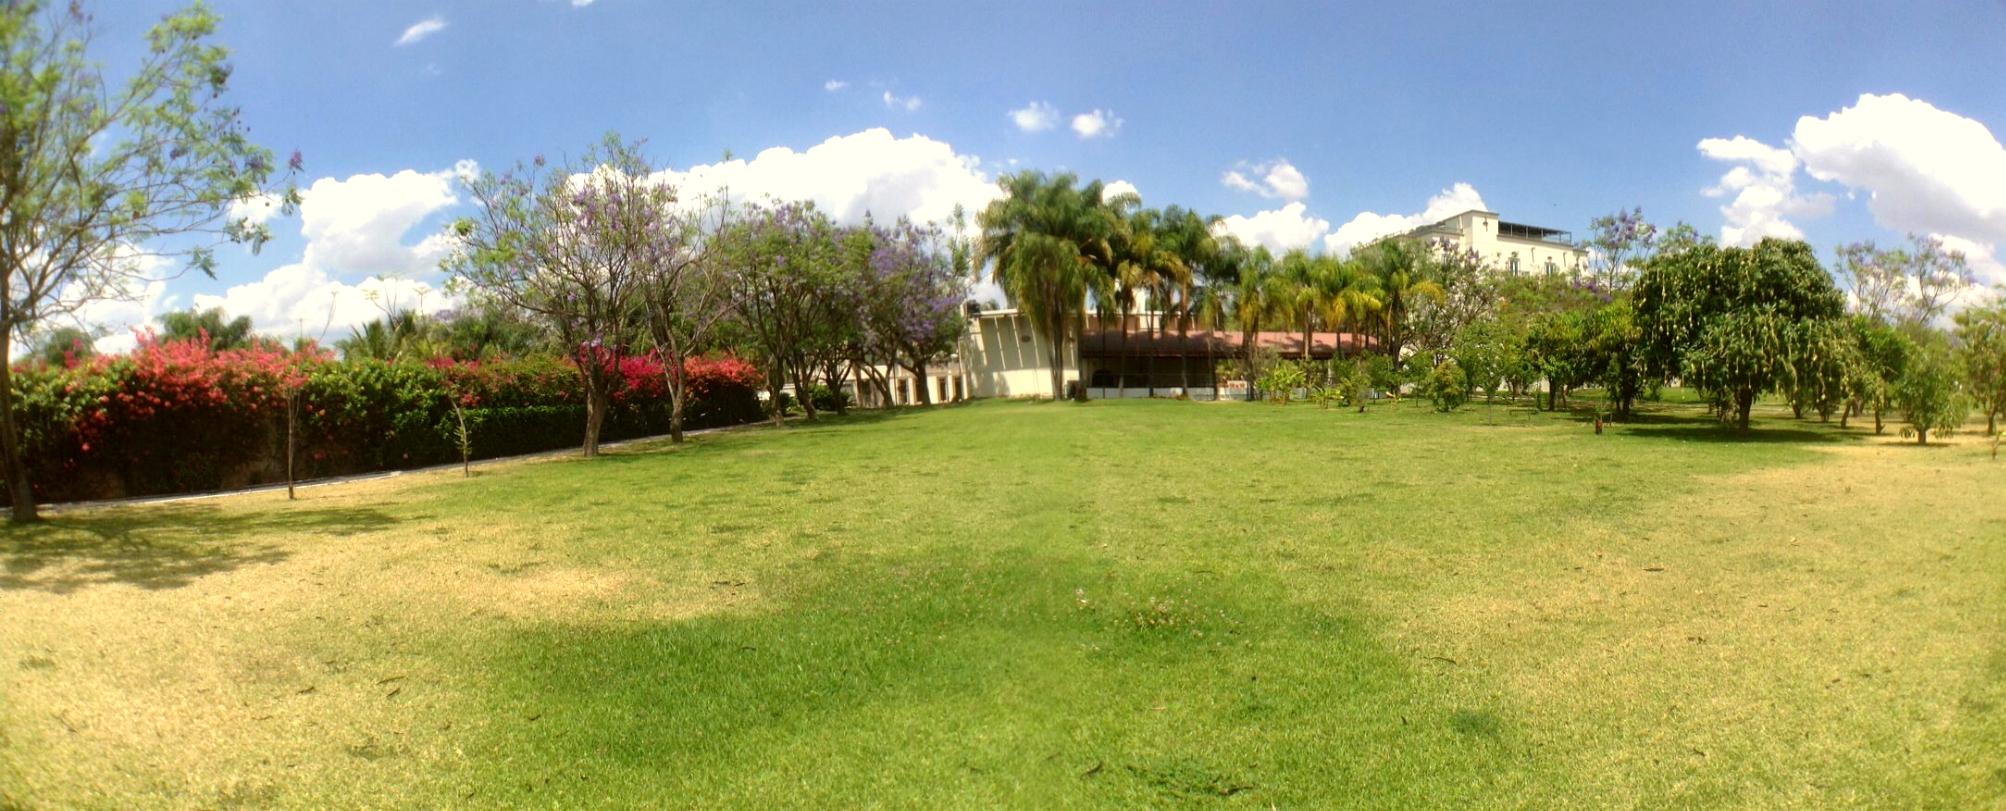 Jardines villa toscana 8.jpg